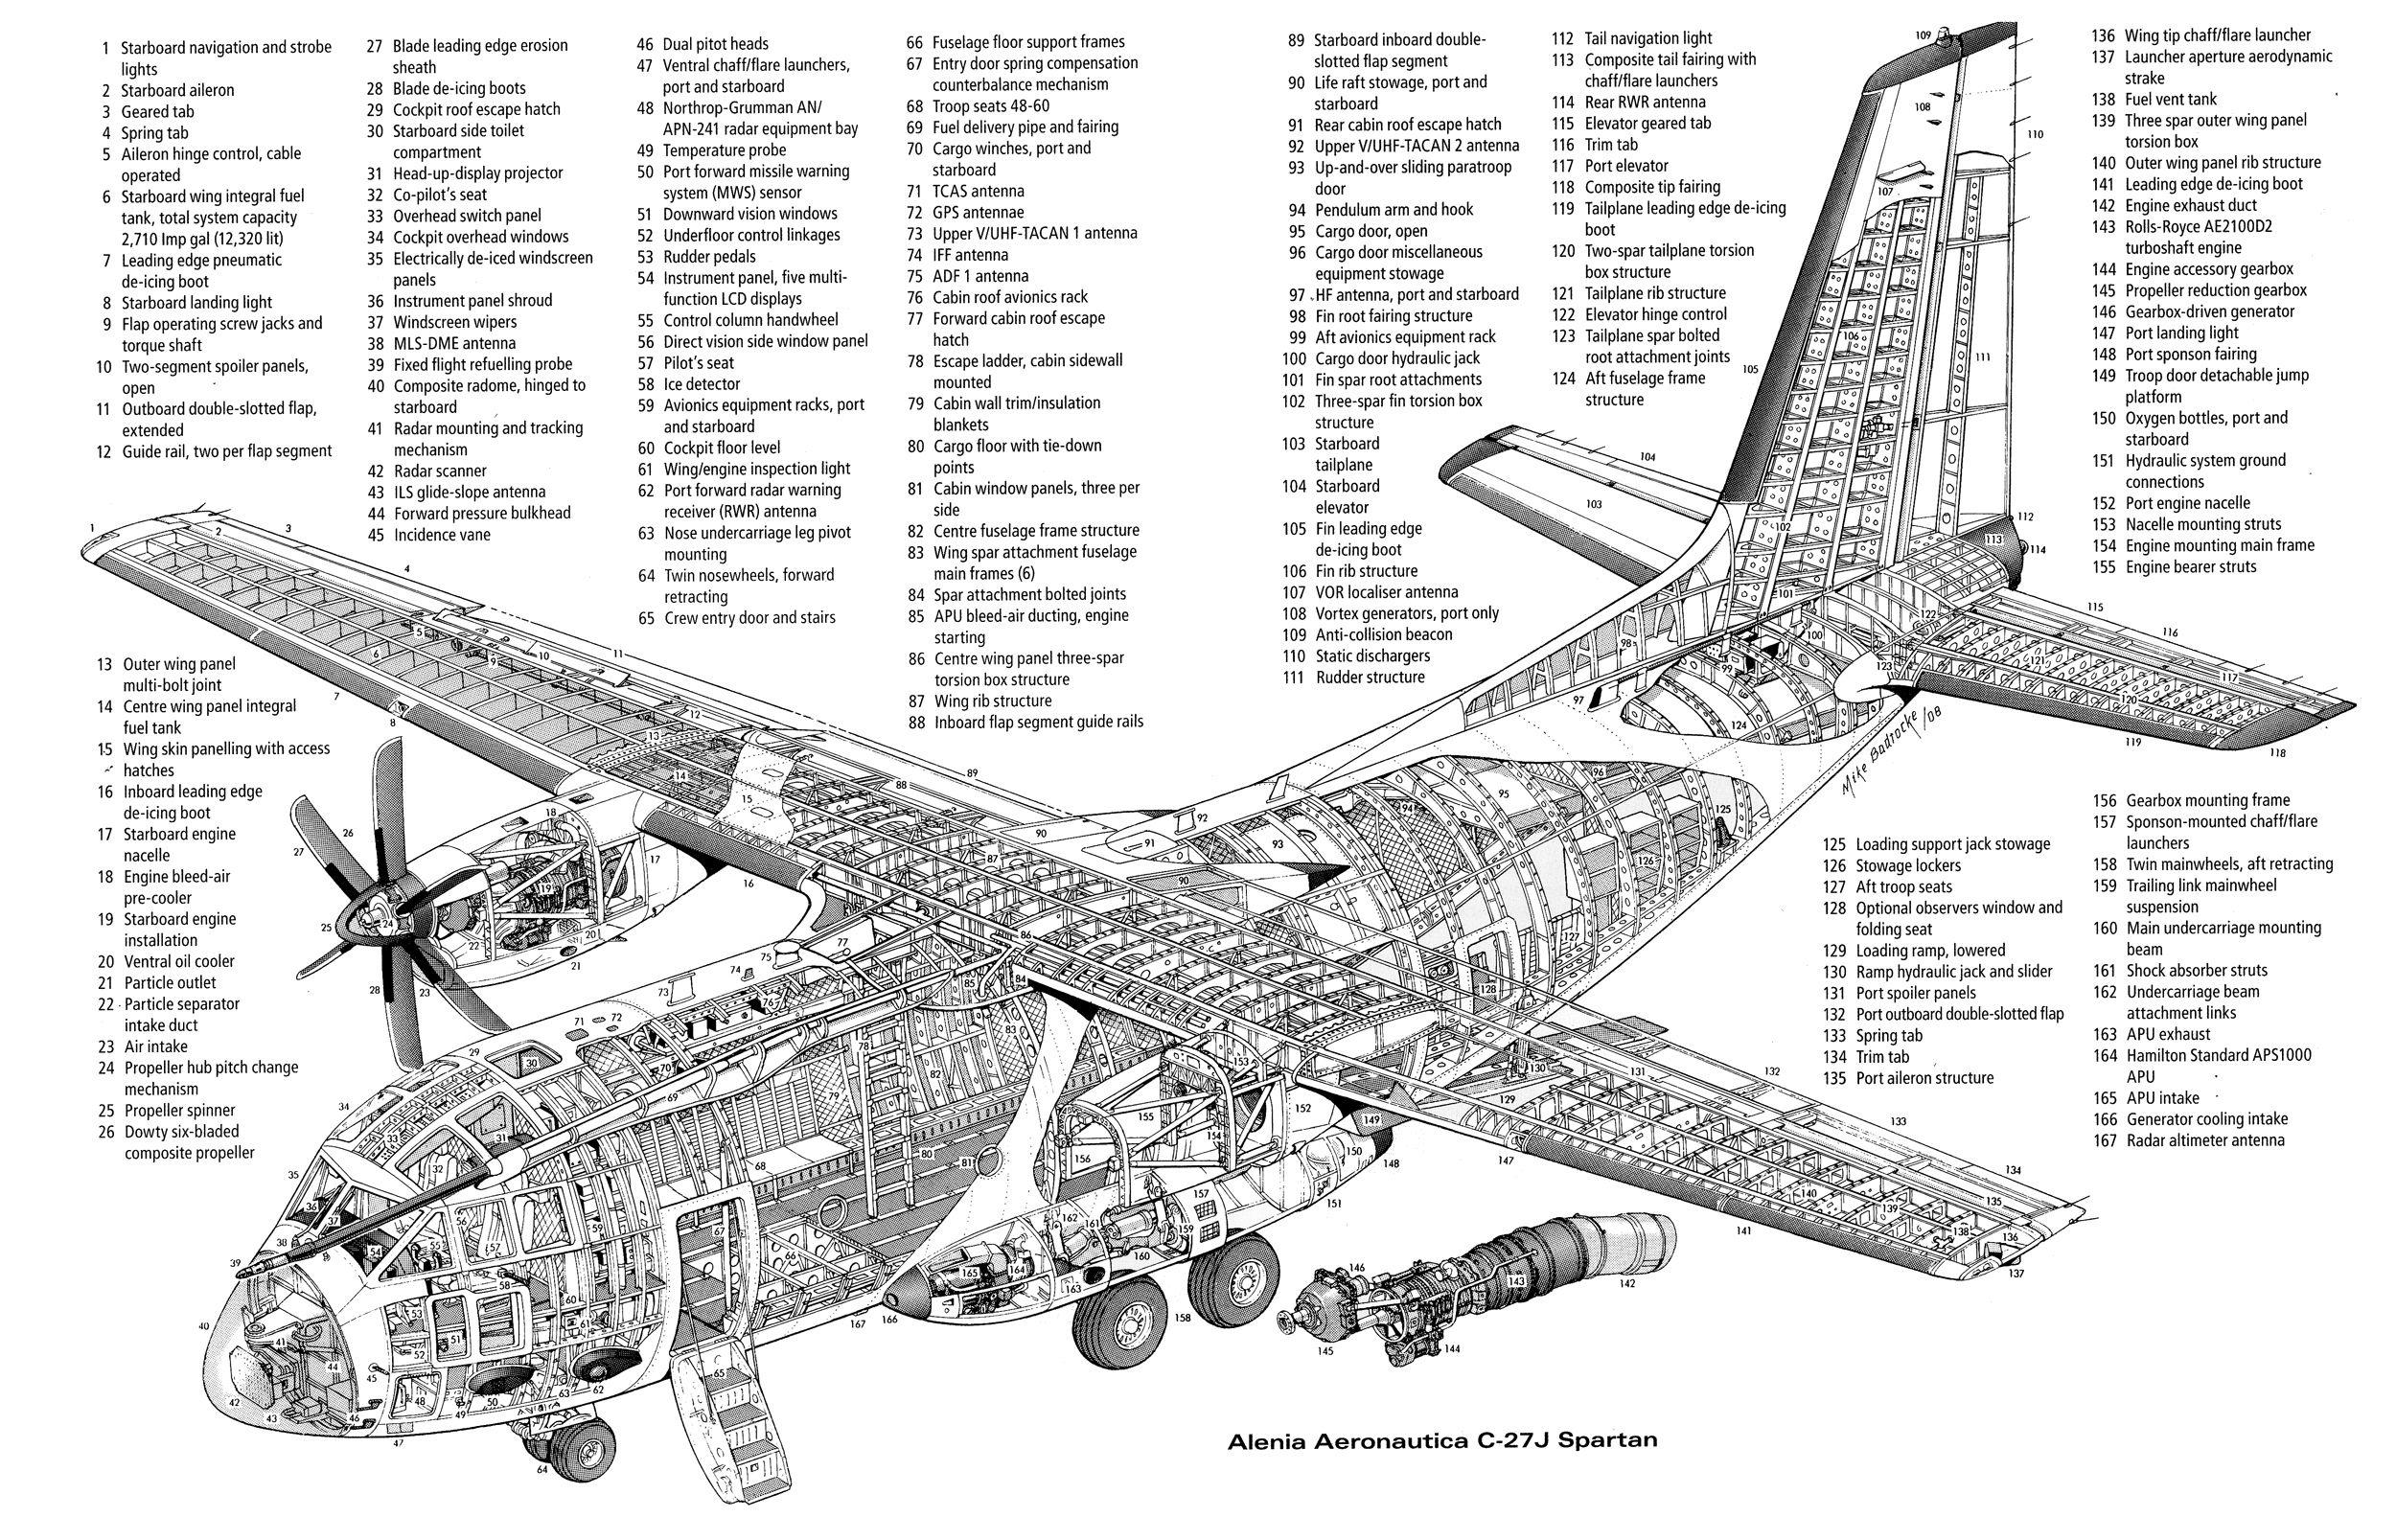 alenia aeronautica c 27j spartan airplanes blueprints airplanes and aircraft